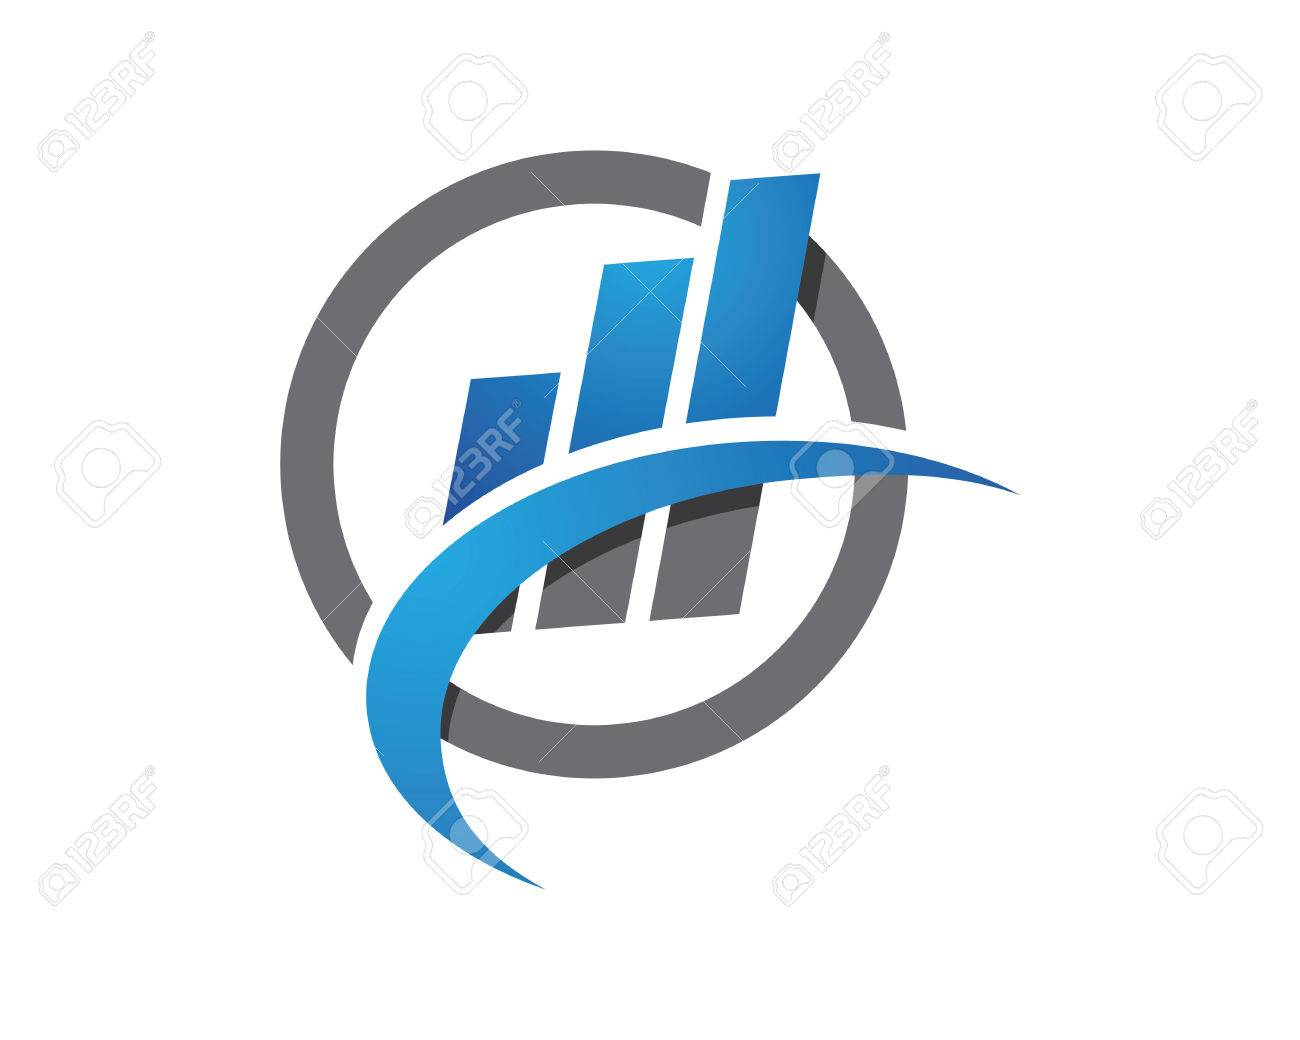 Business Finance professional logo template - 48745172